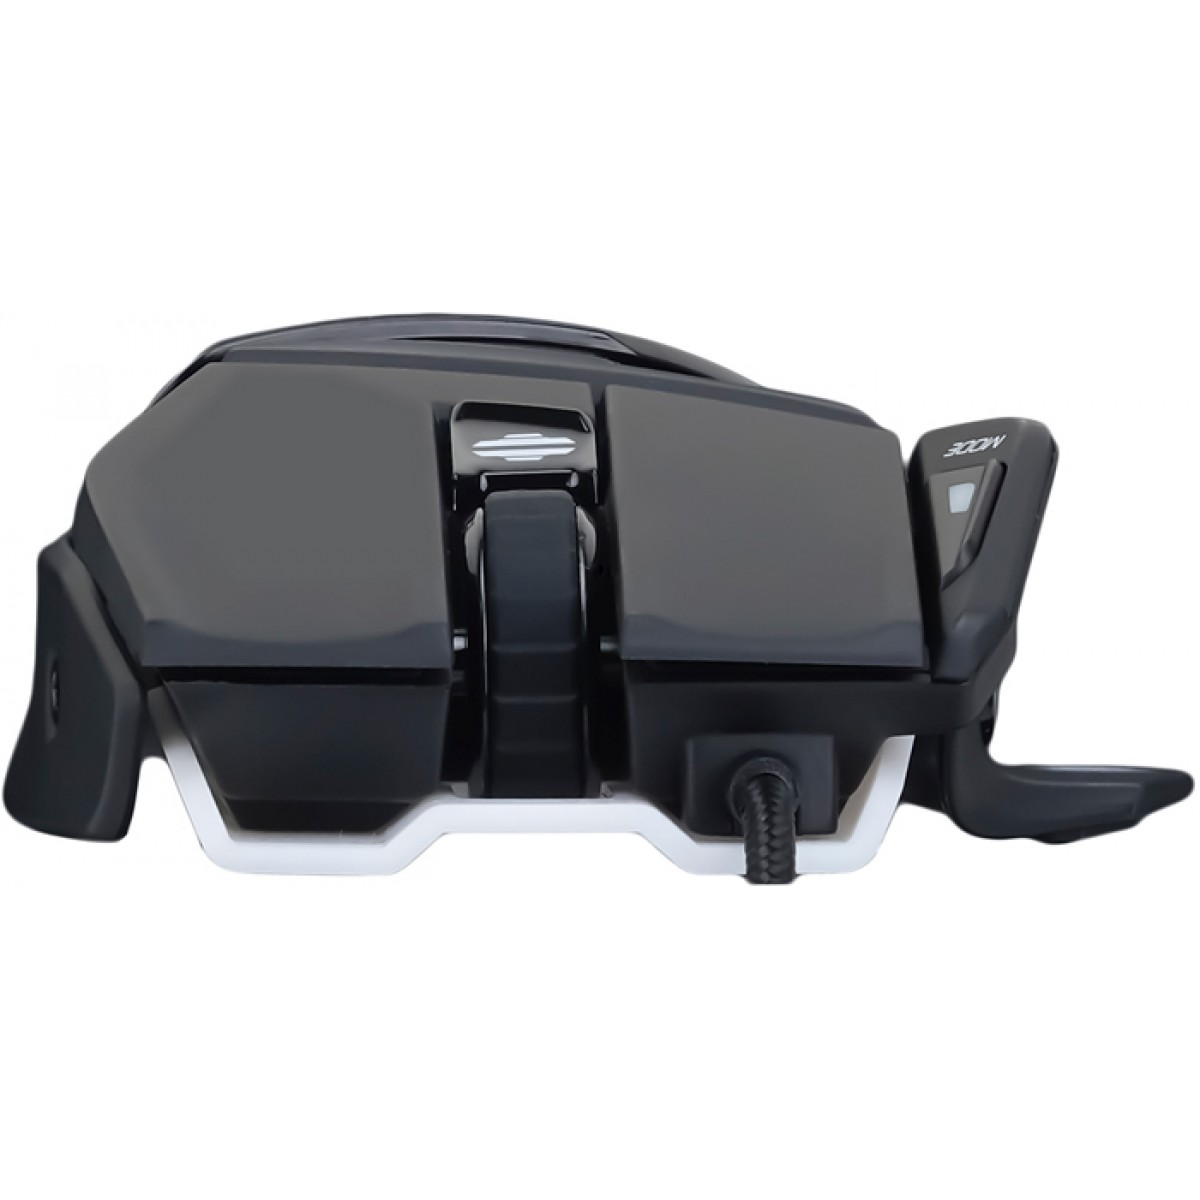 Mouse Gamer Mad Catz RAT 4+, 7200 DPI, 9 Botões, Black, MR03MCAMBL00